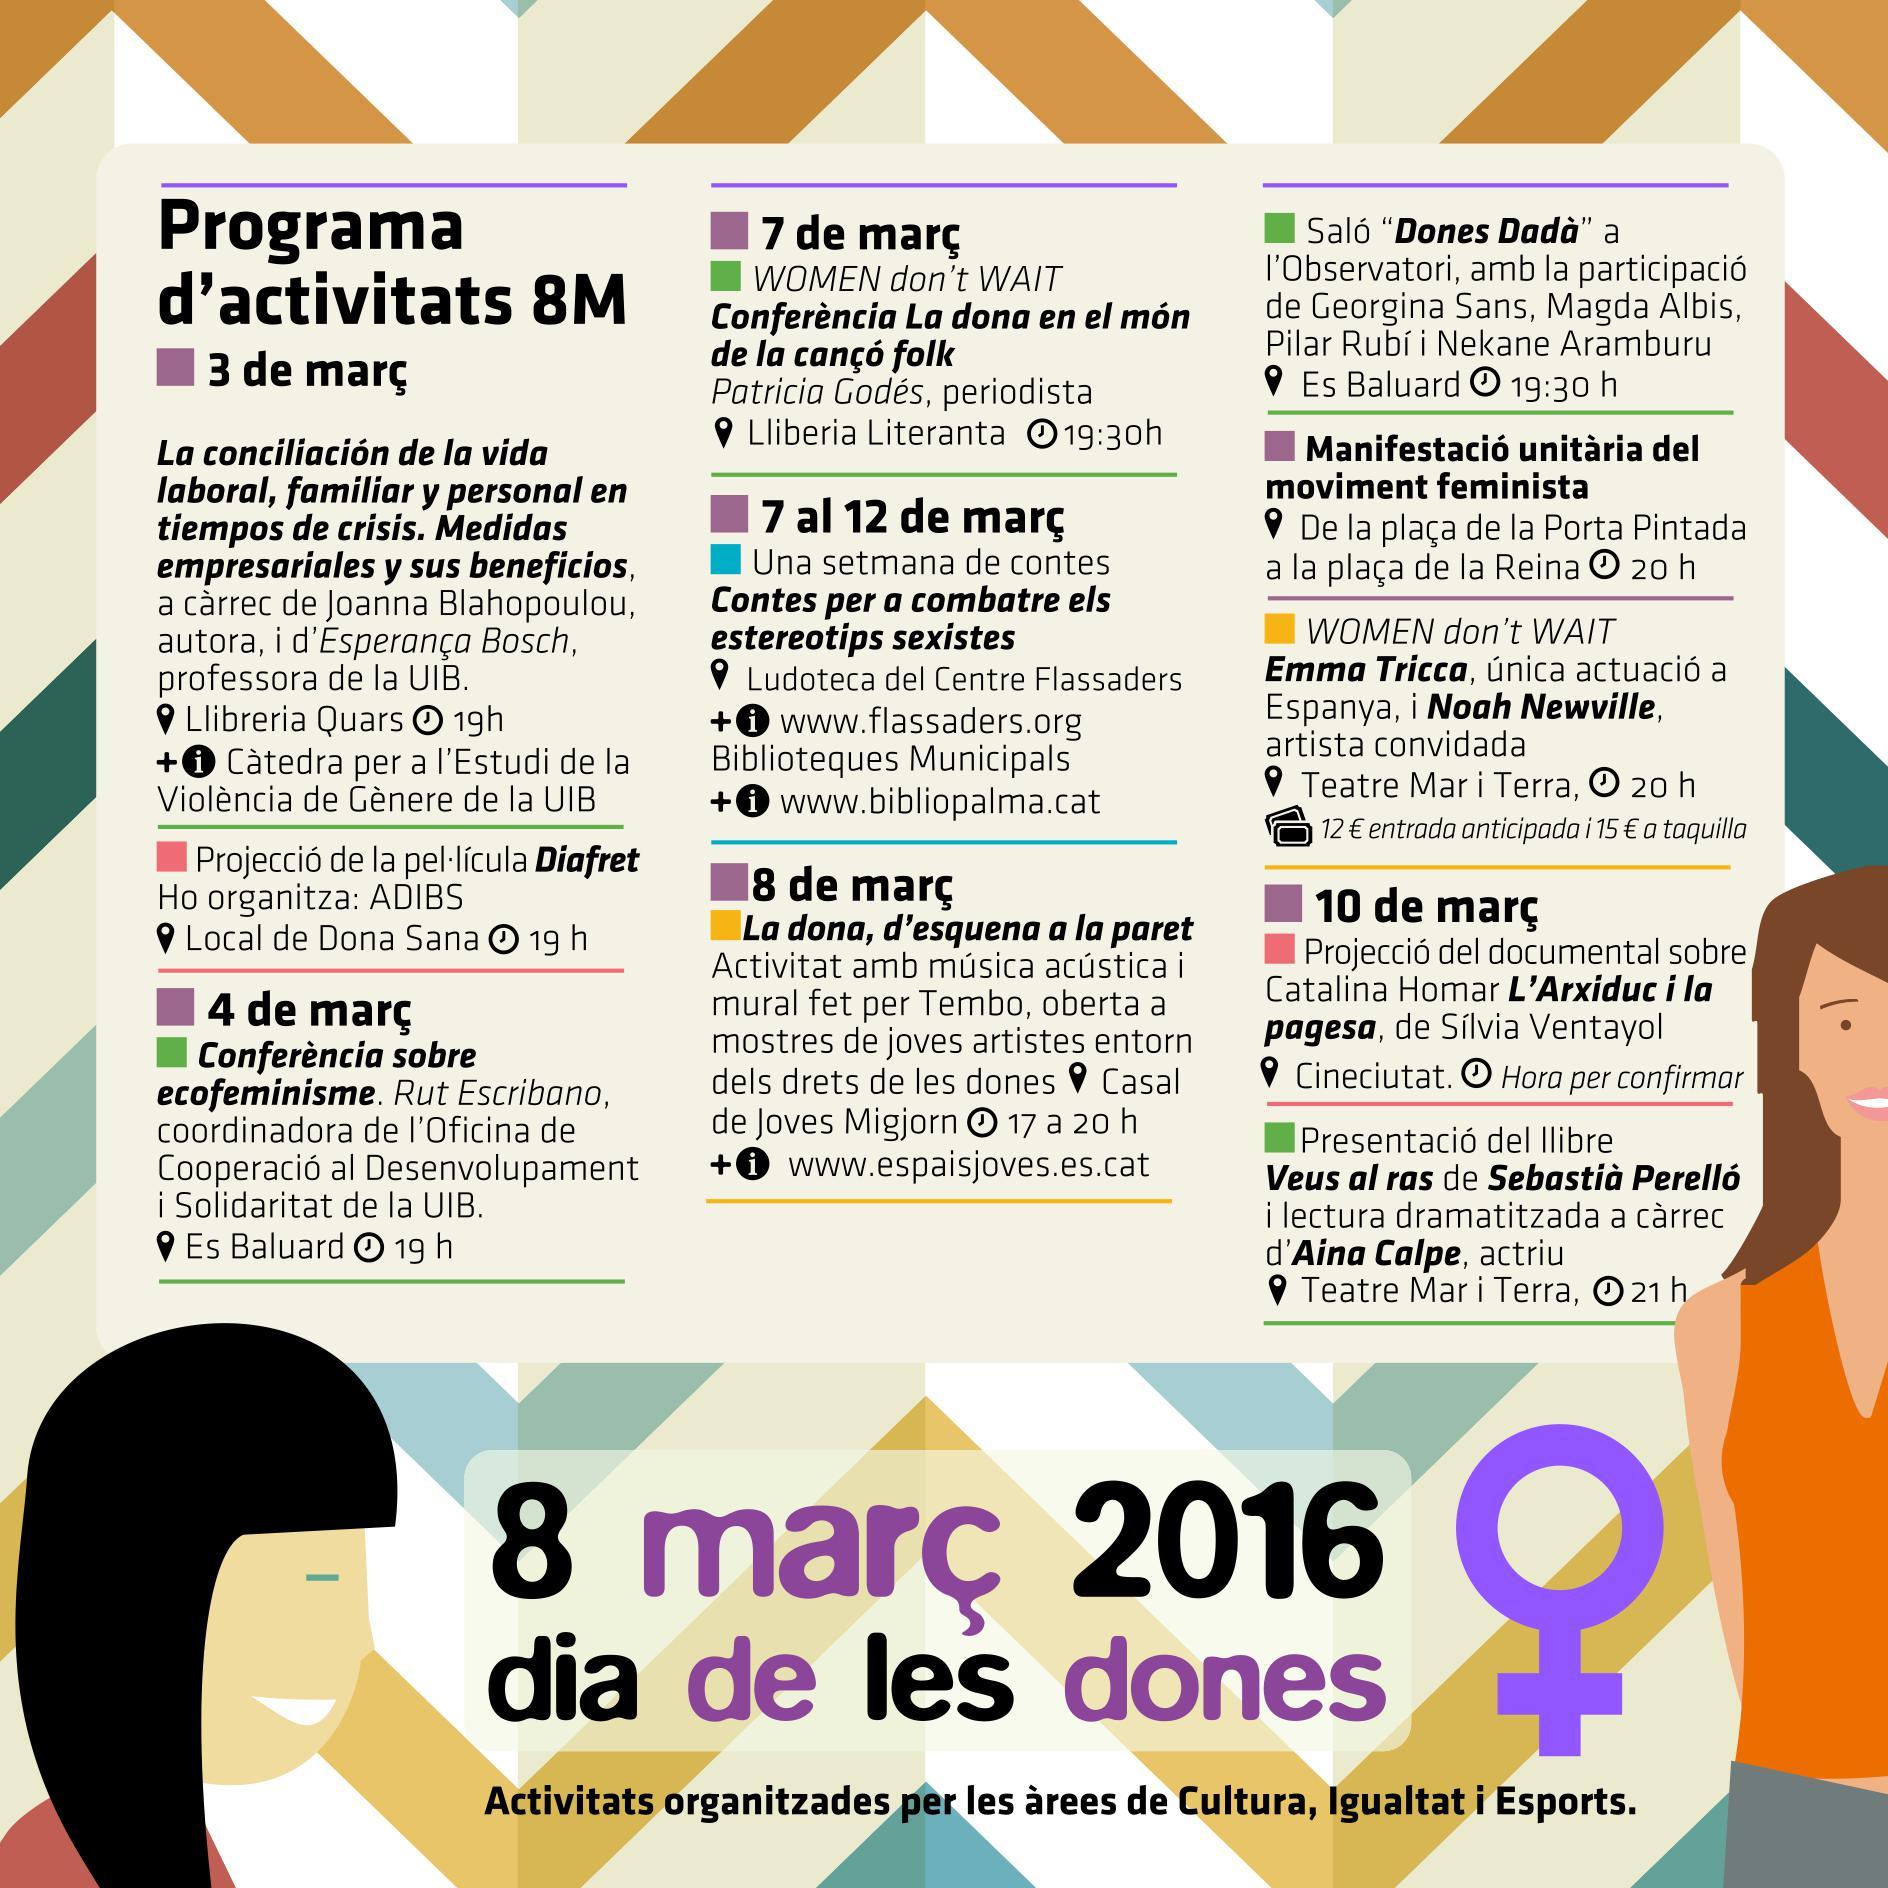 Programa 3